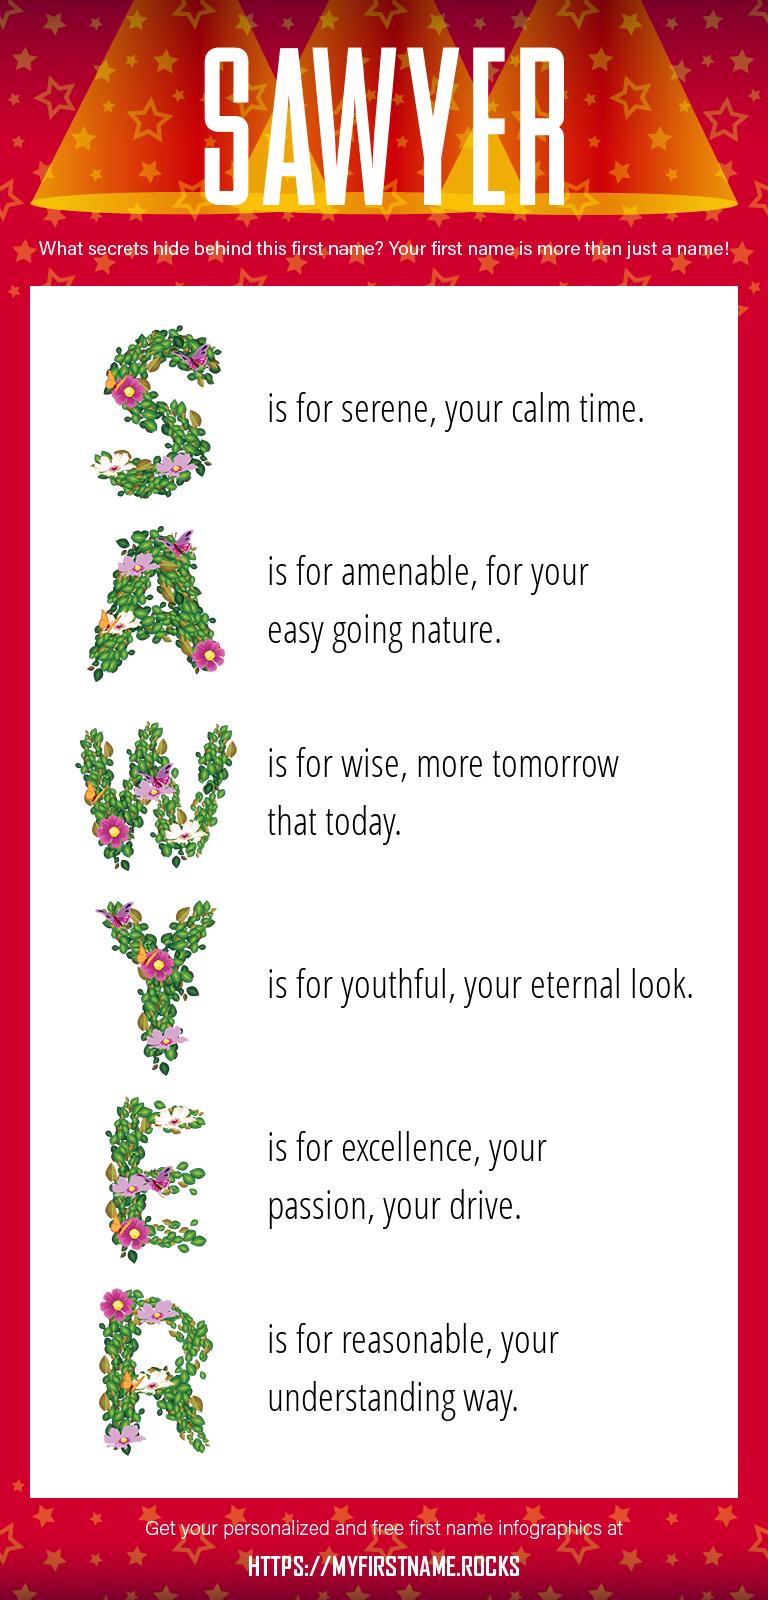 Sawyer Infographics